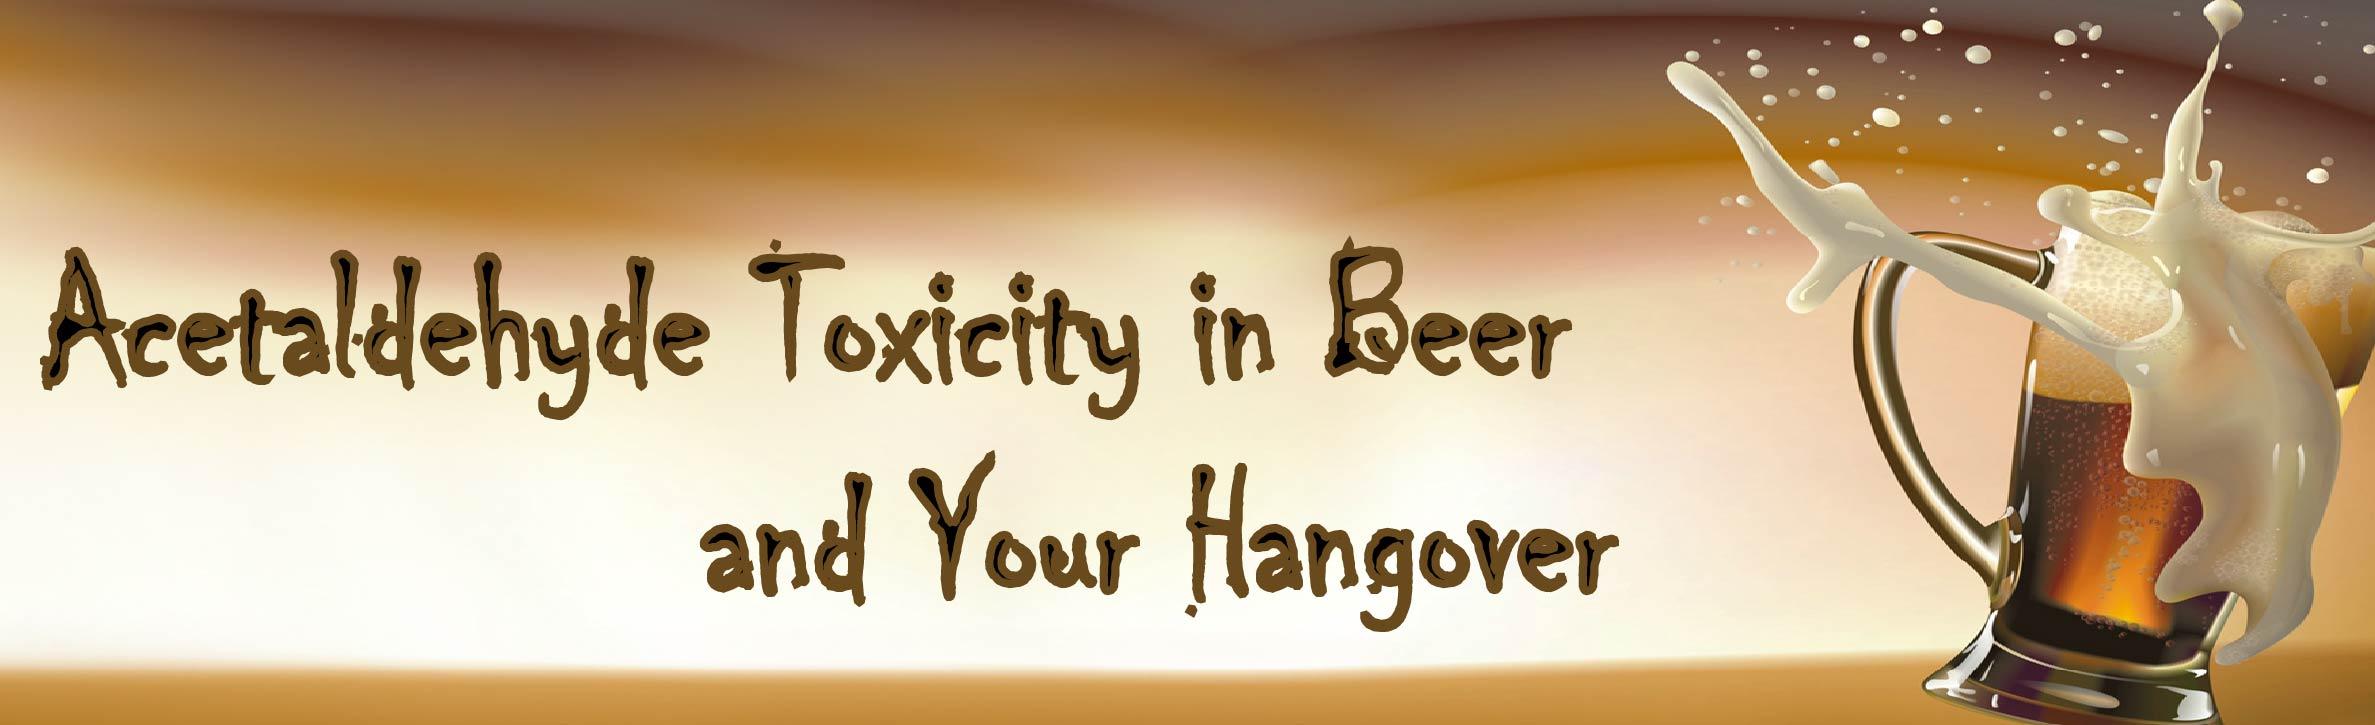 Acetaldehyde Beer, Acetaldehyde Toxicity and Your Hangover